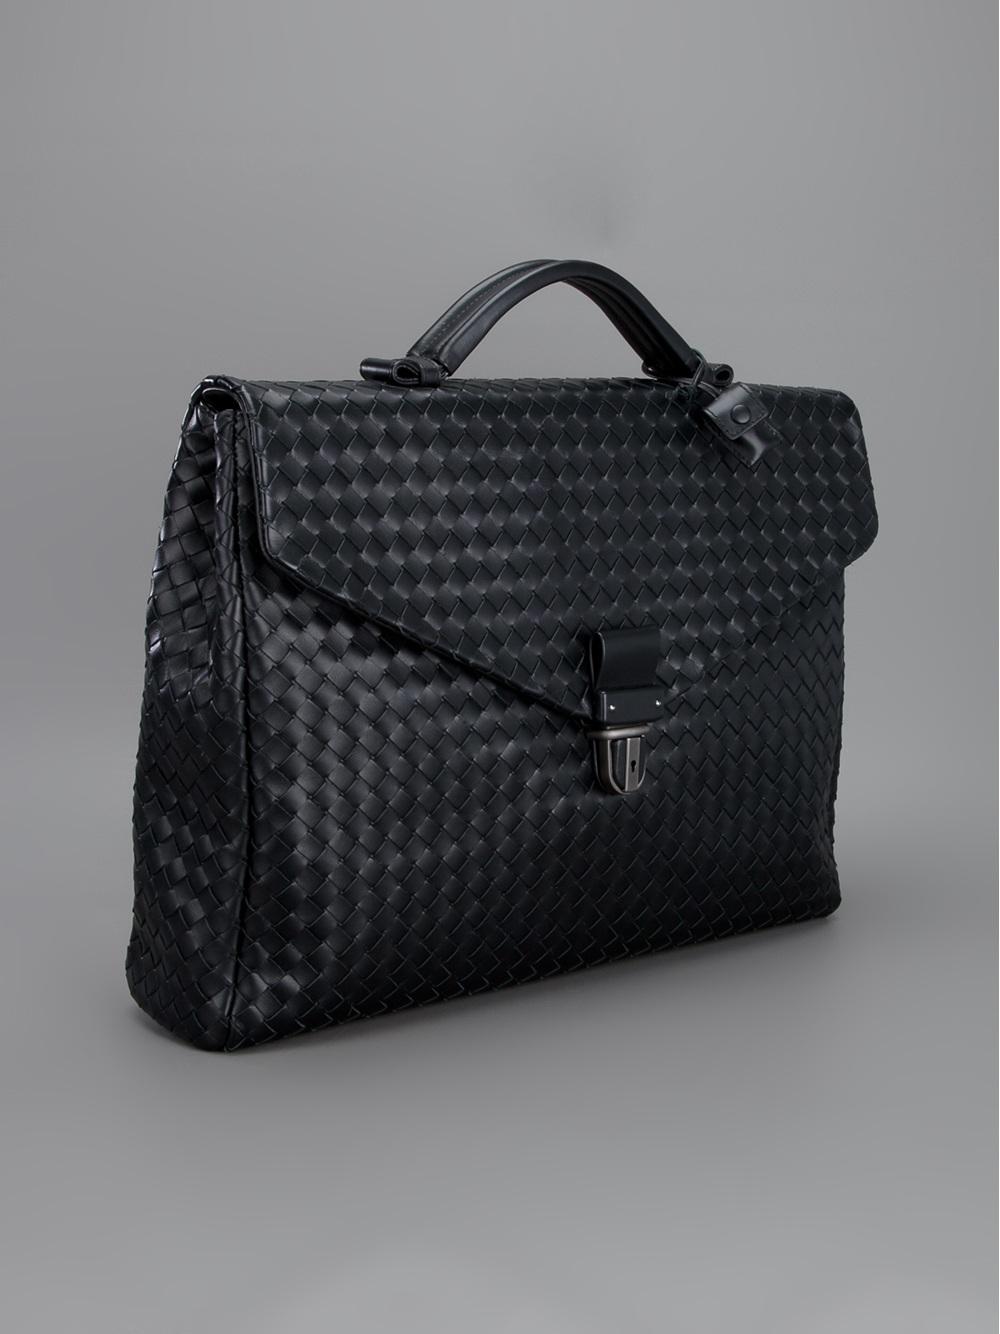 63000a183085 Lyst - Bottega Veneta Intrecciato Weave Briefcase in Black for Men